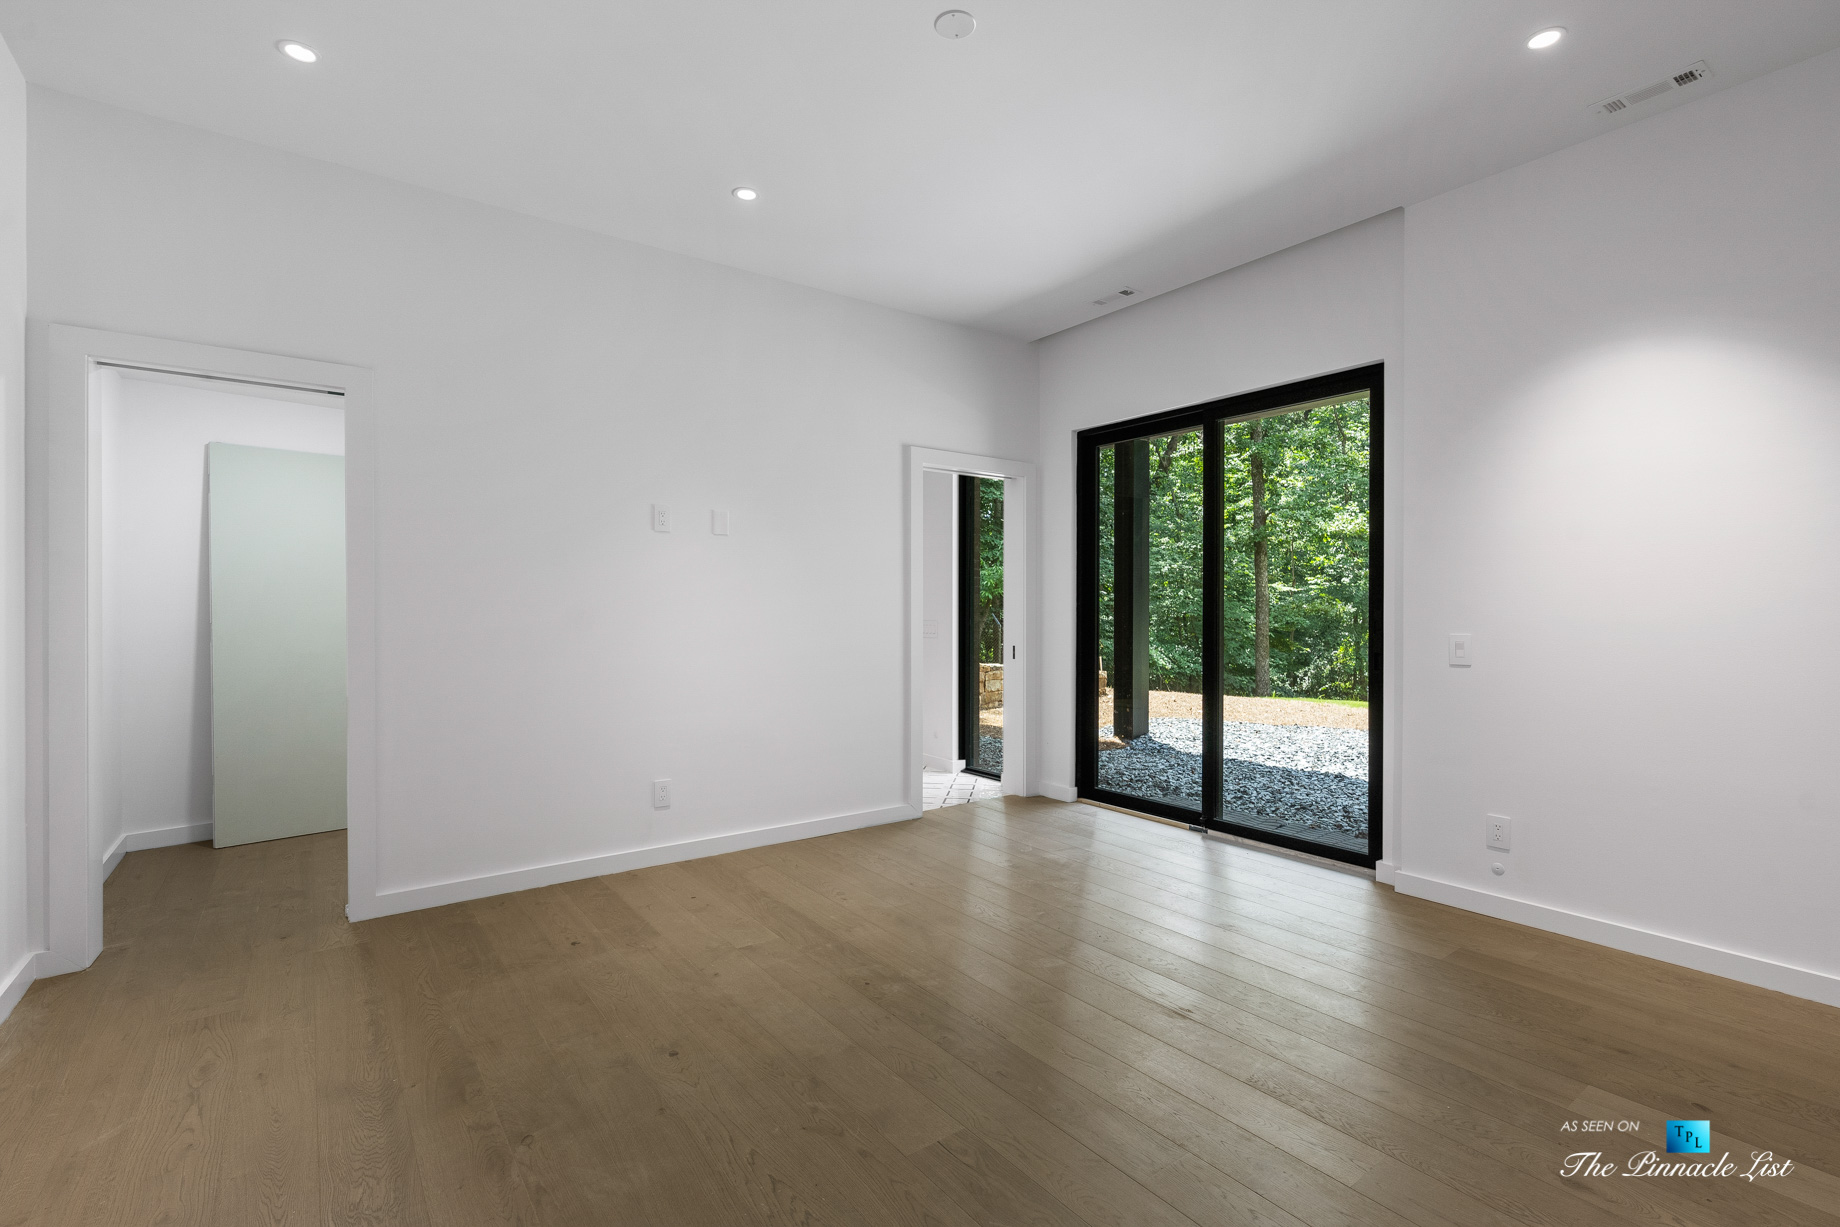 2716 Ridgewood Rd NW, Atlanta, GA, USA – Bedroom – Luxury Real Estate – Modern Contemporary Buckhead Home